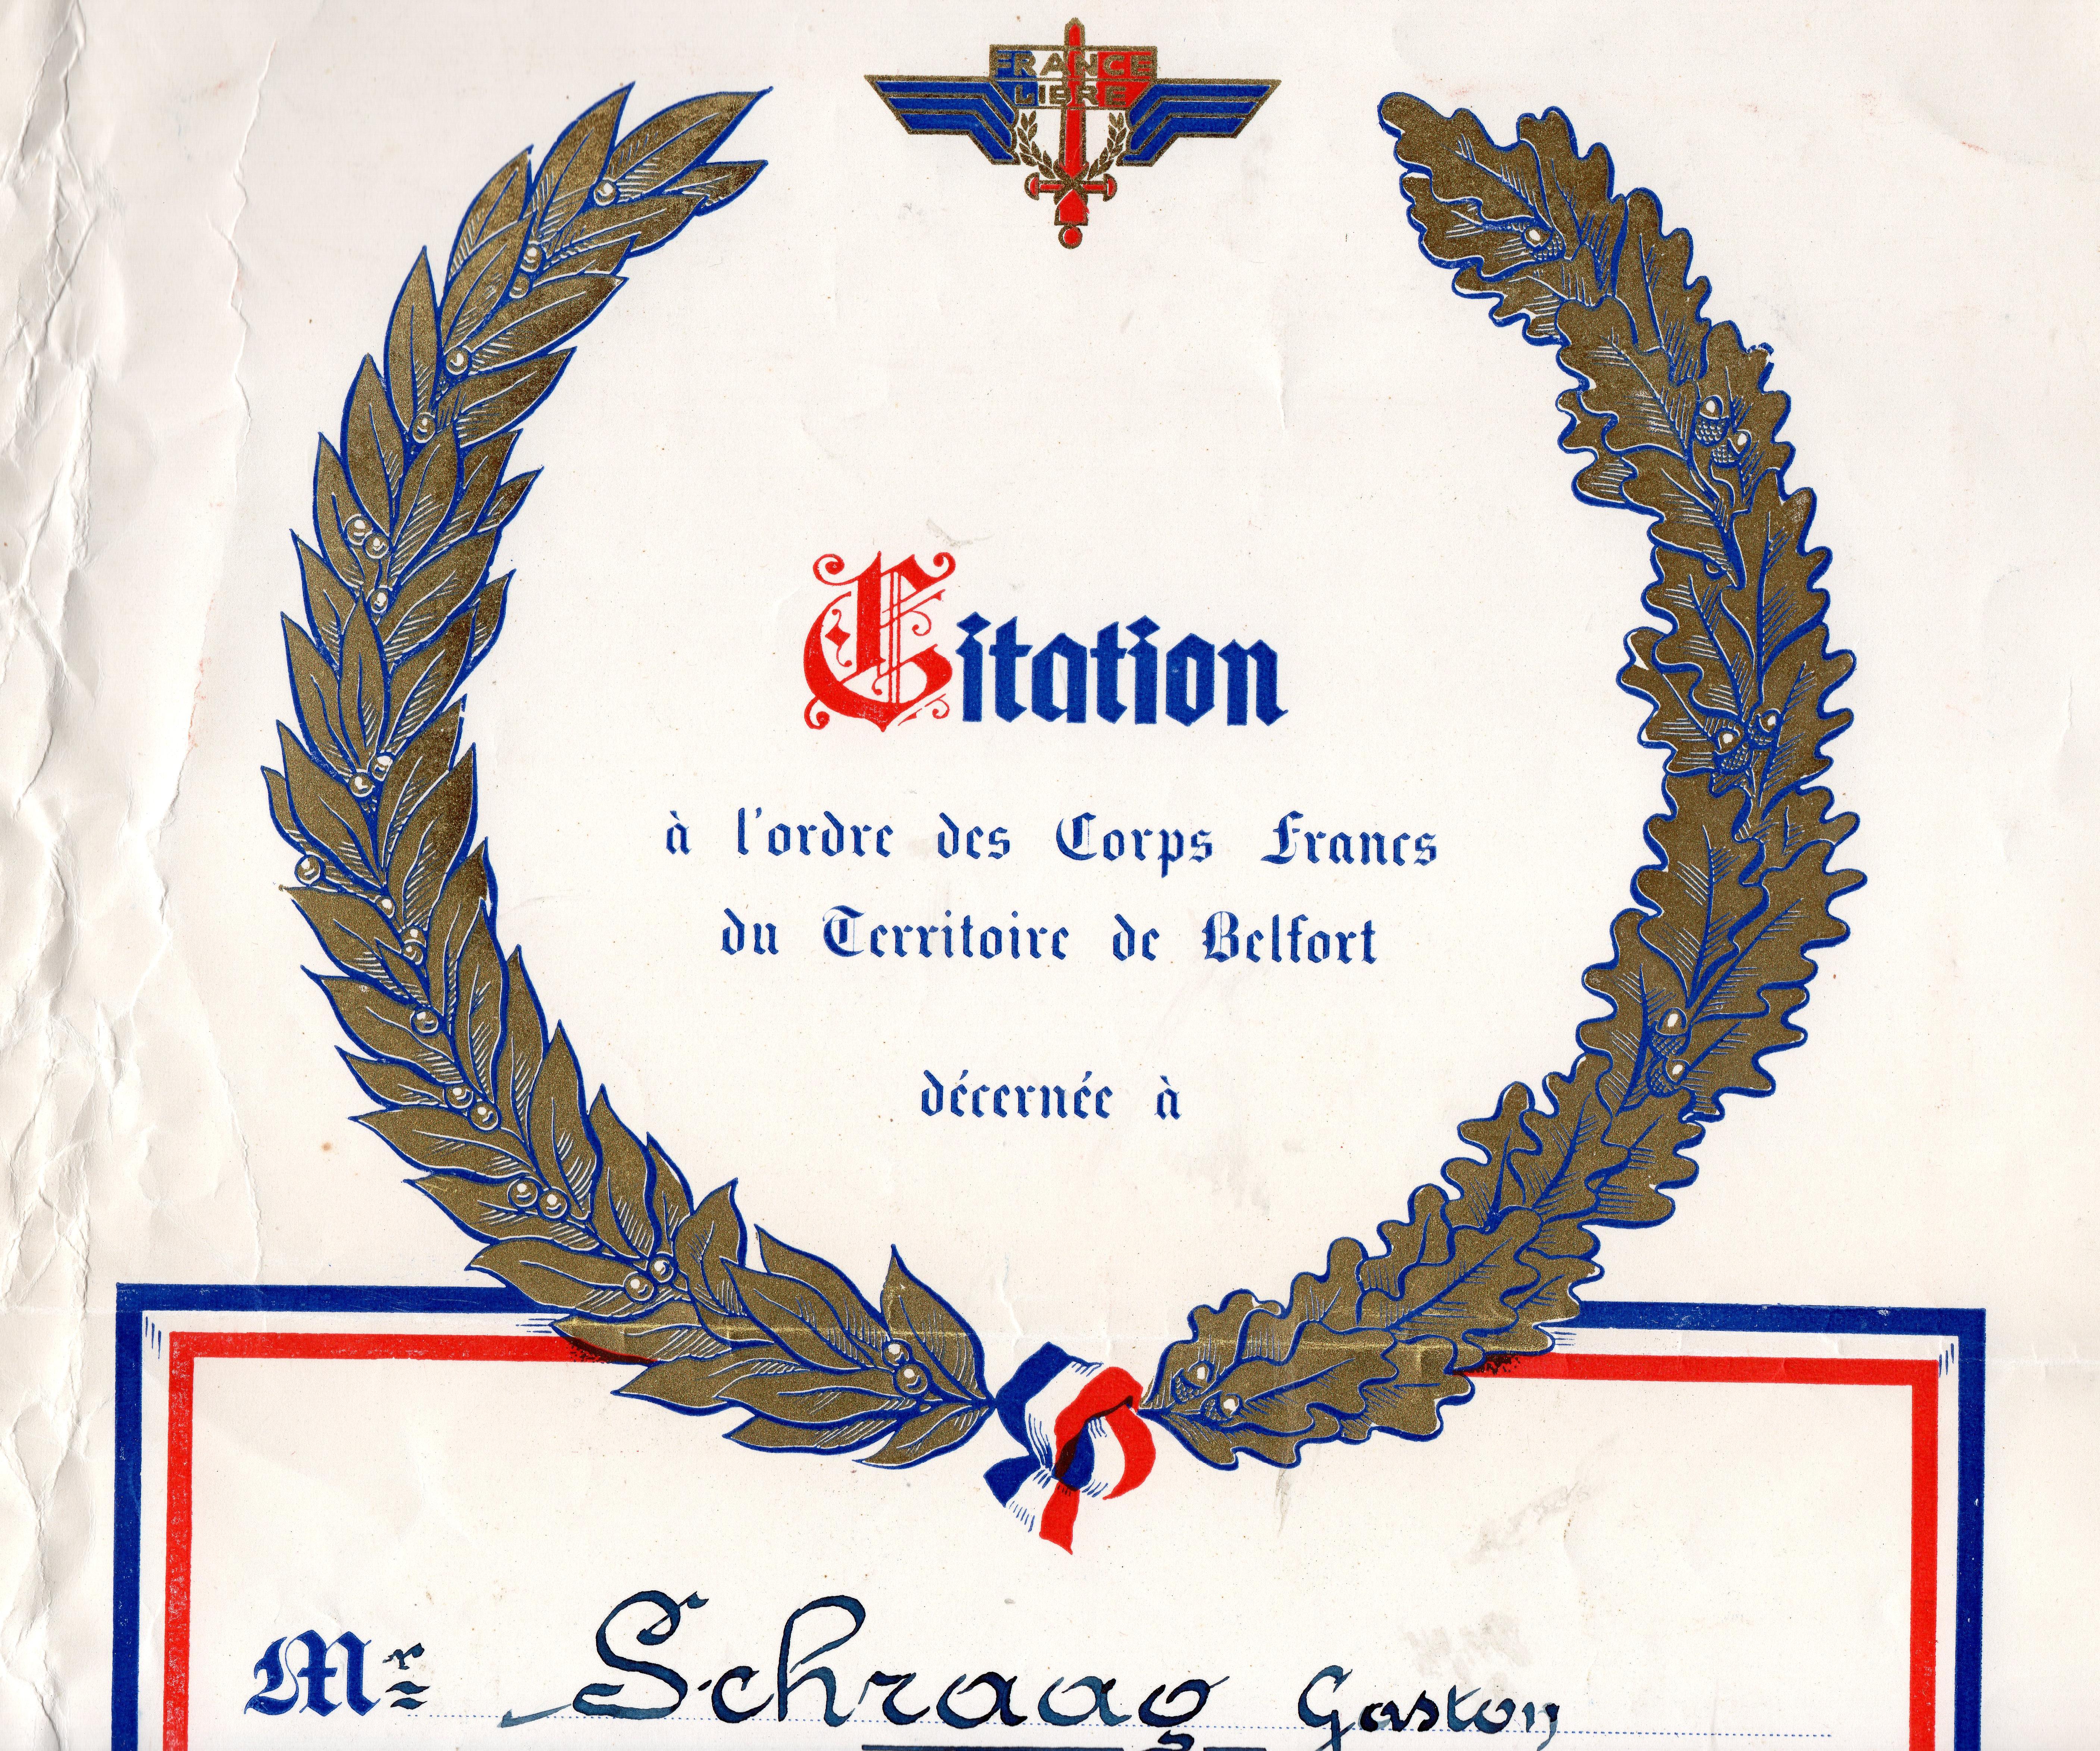 Schraag Citation